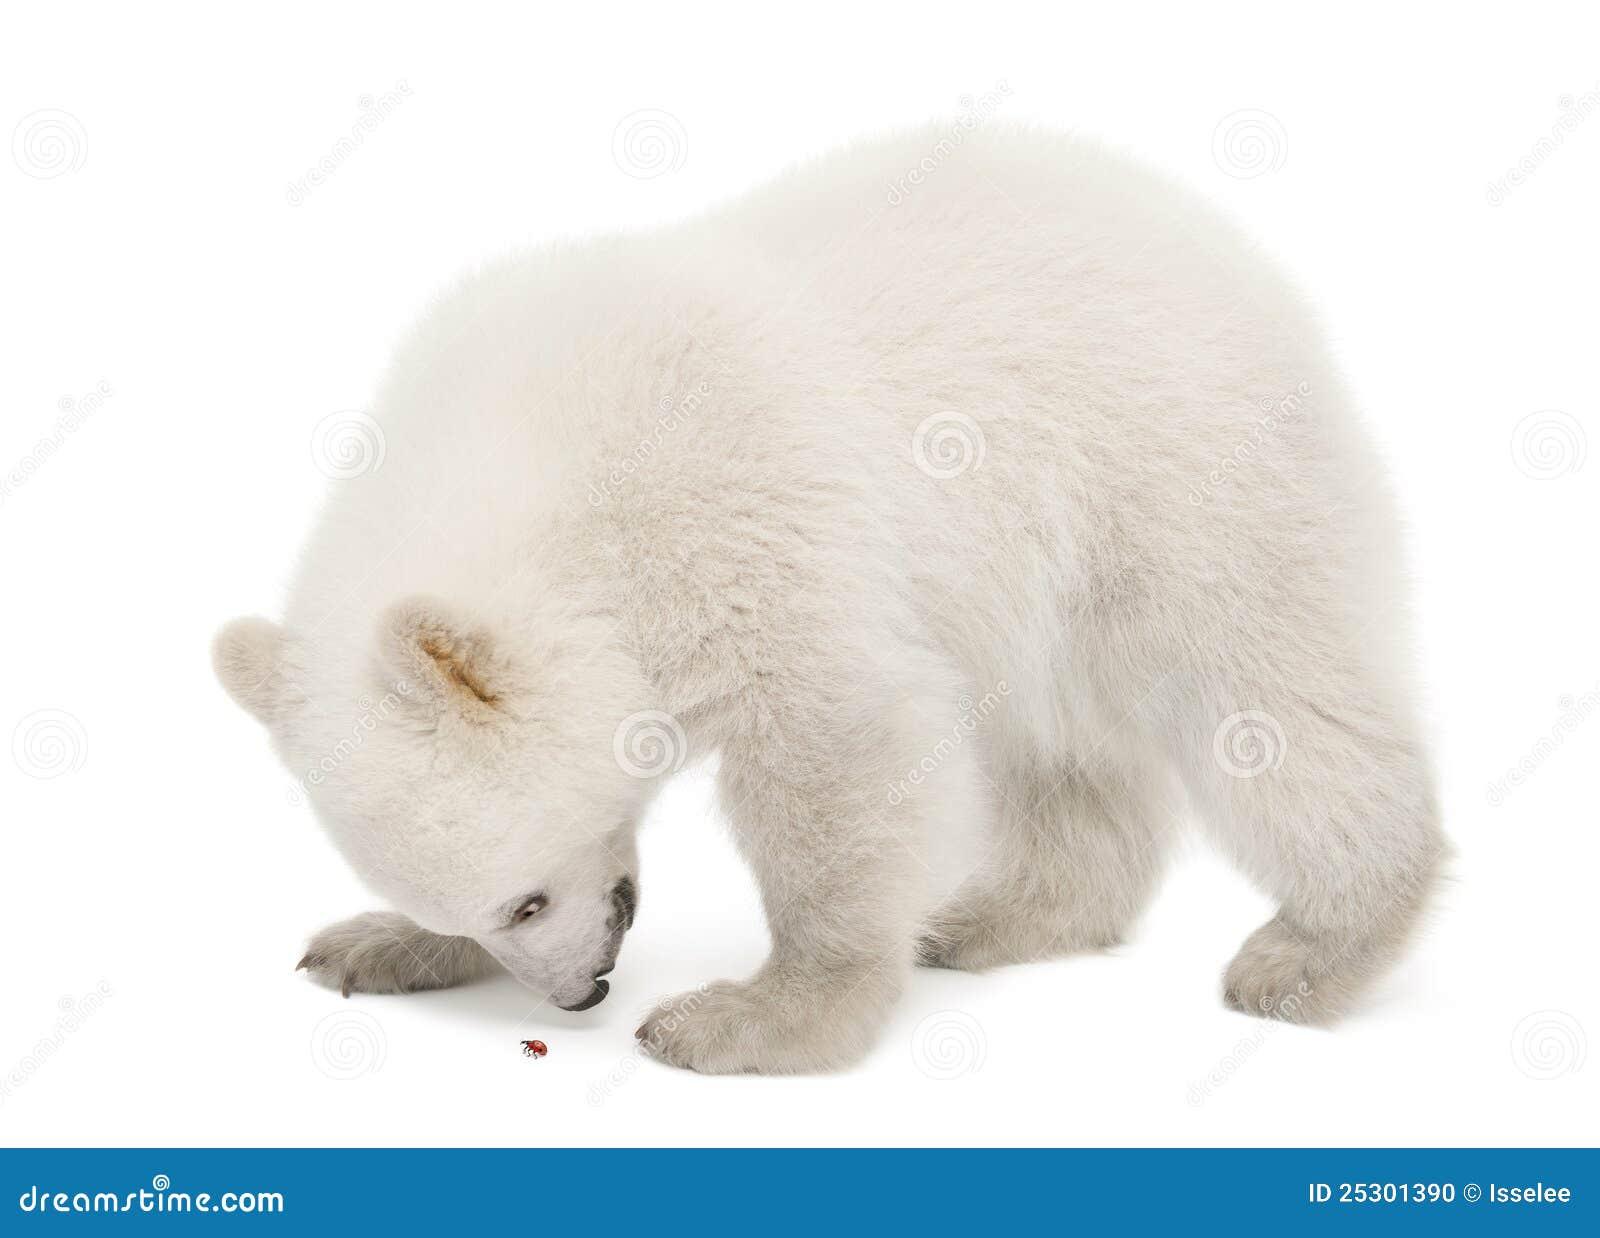 Polar Bear Cub Ursus Maritimus 6 Months Old Stock Photo